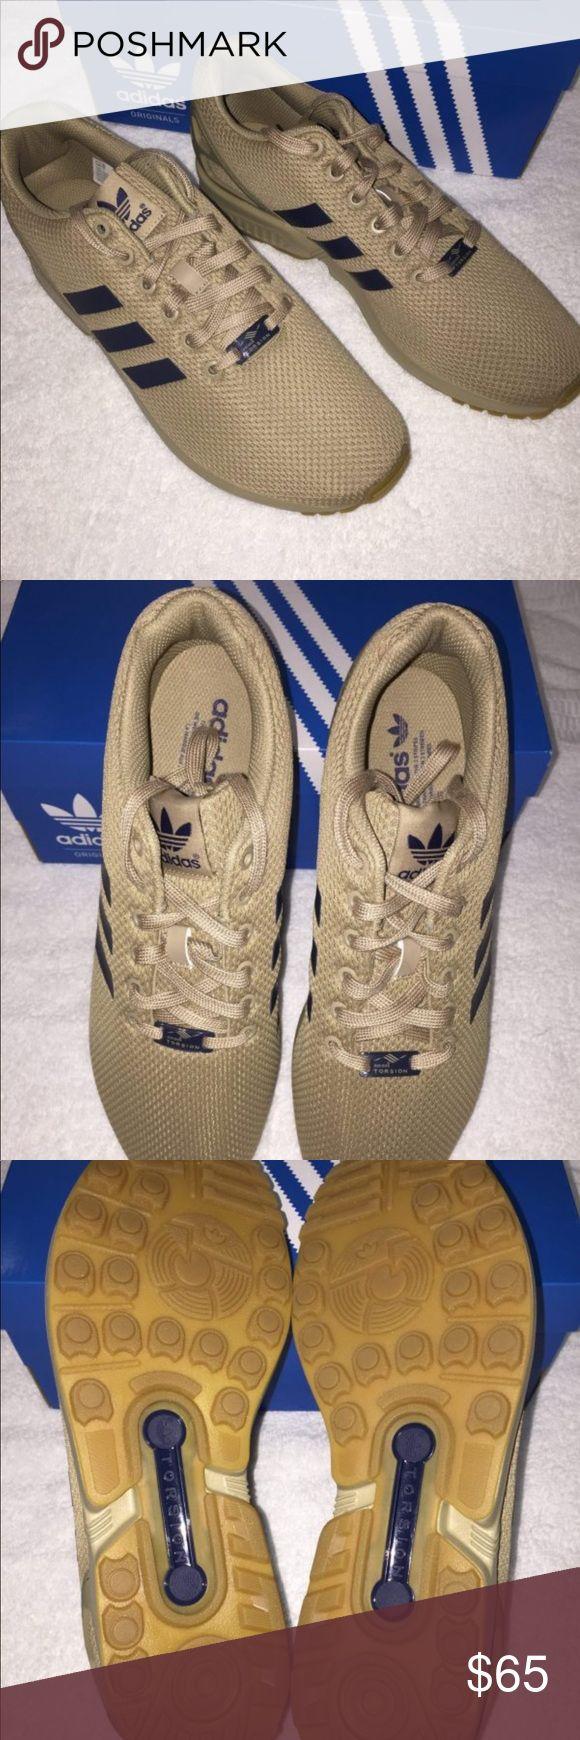 Men's Adidas ZX Flux Hemp Gum Original running shoes adidas Shoes Athletic Shoes